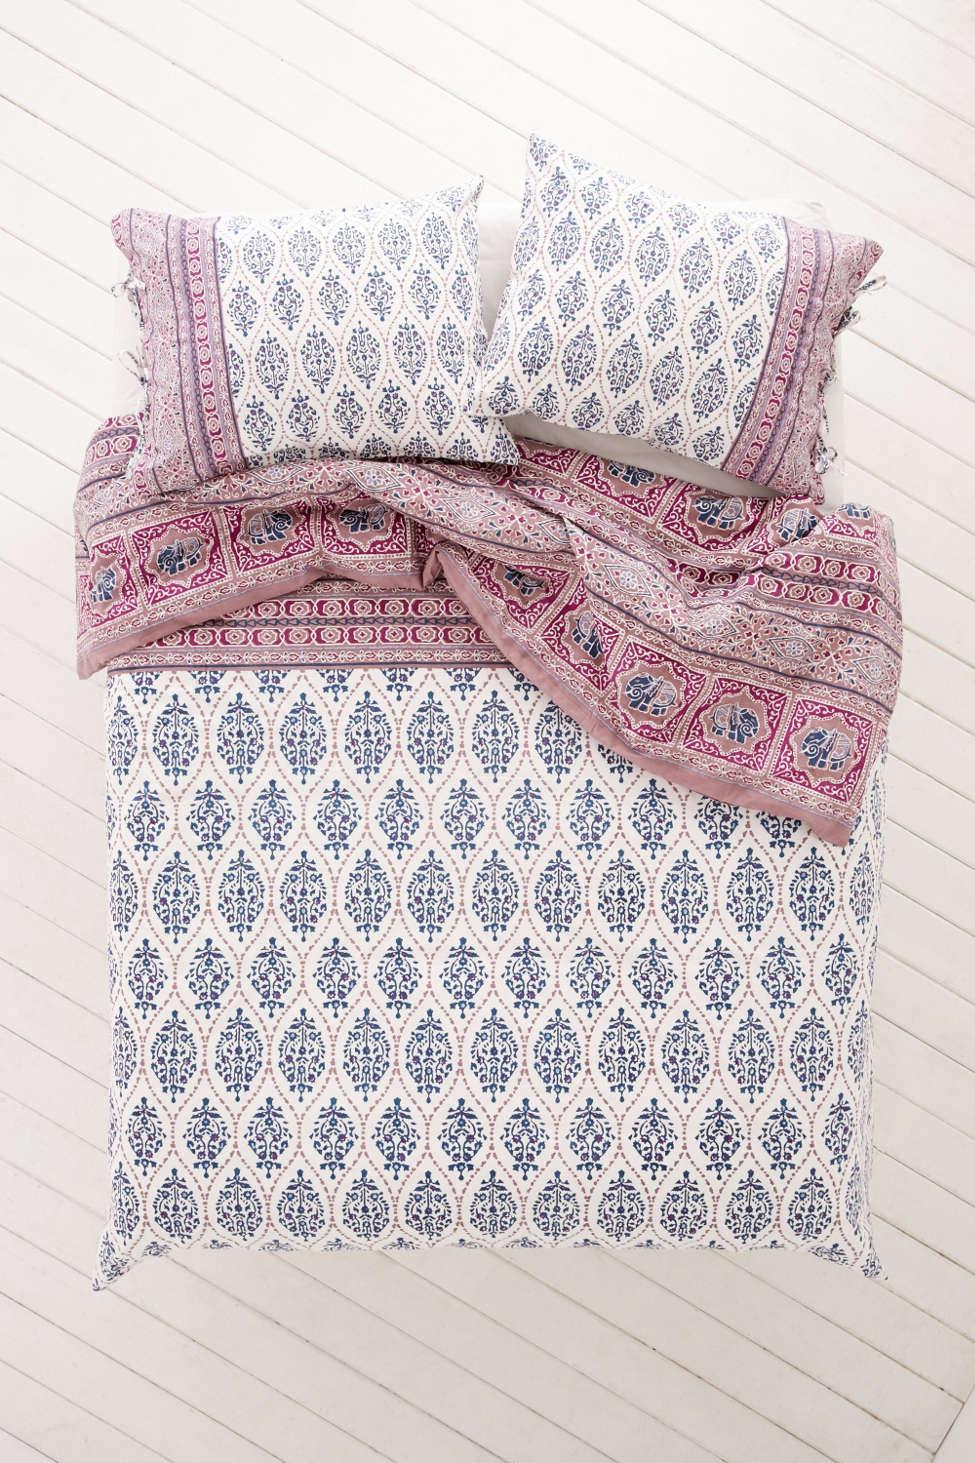 plum & bow sofia block duvet cover | urban outfitters